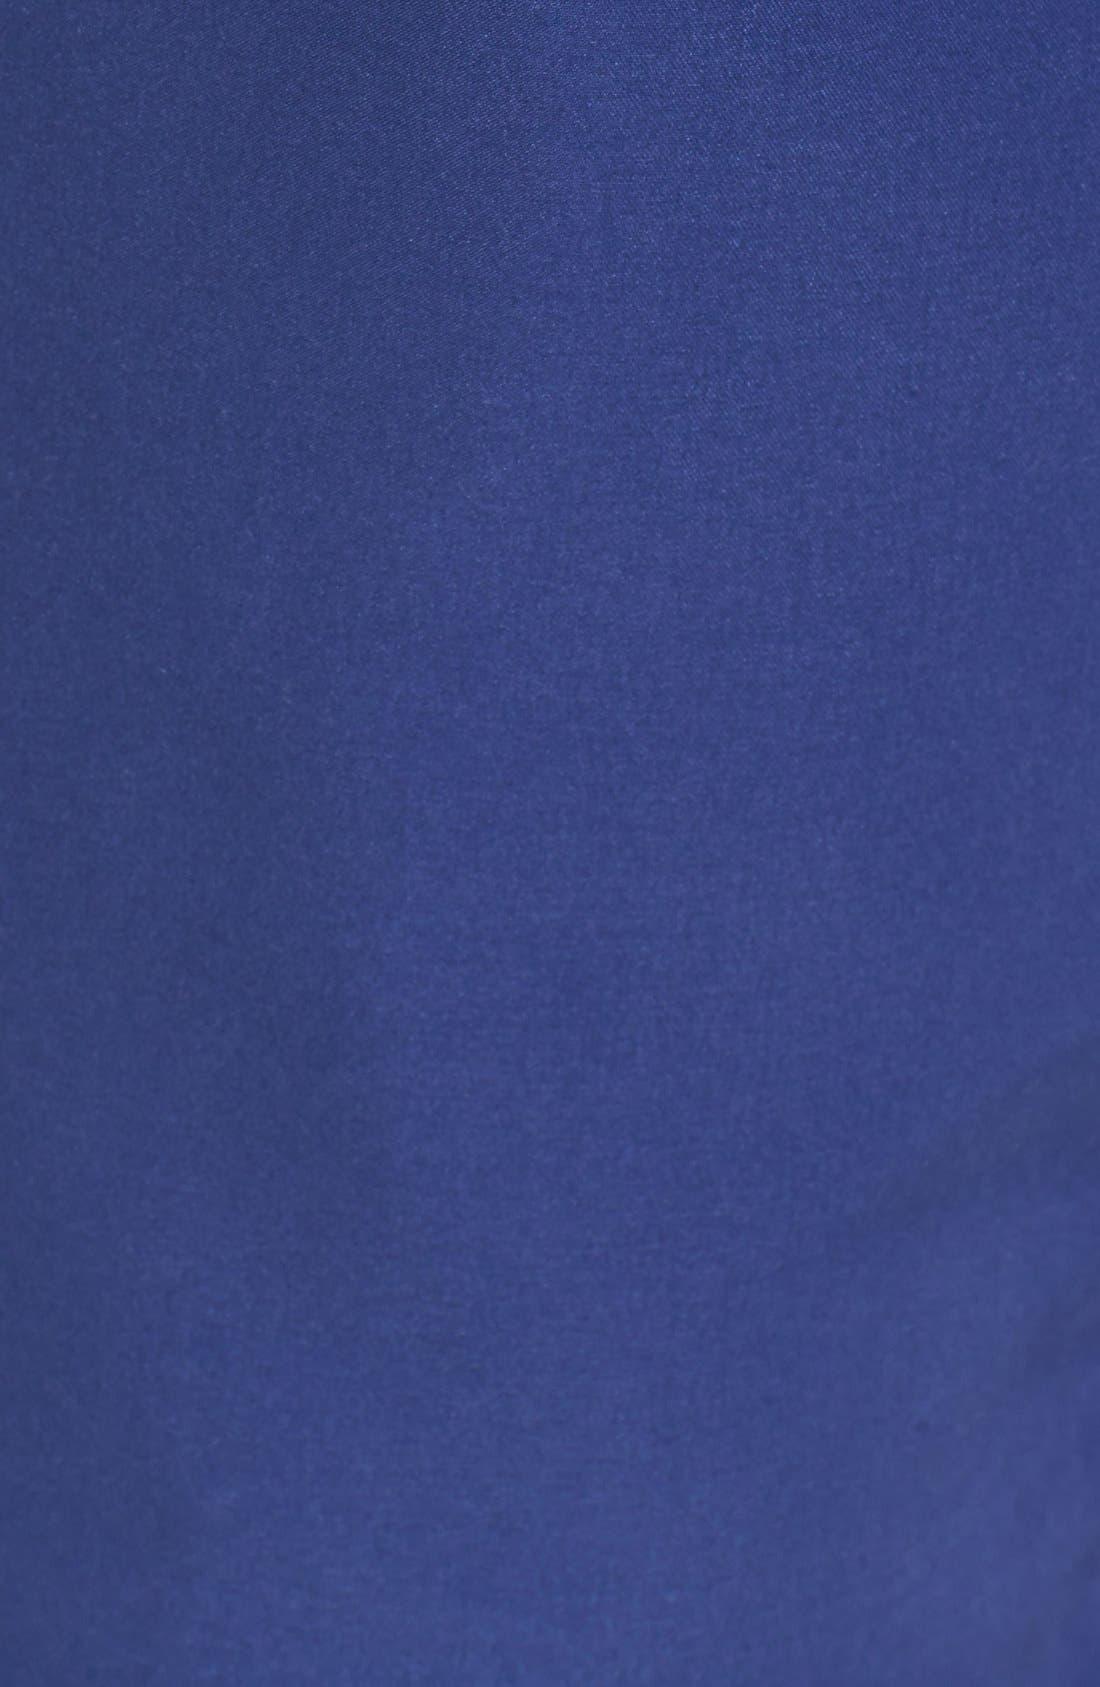 Solid Swim Trunks,                             Alternate thumbnail 5, color,                             Twilight Blue